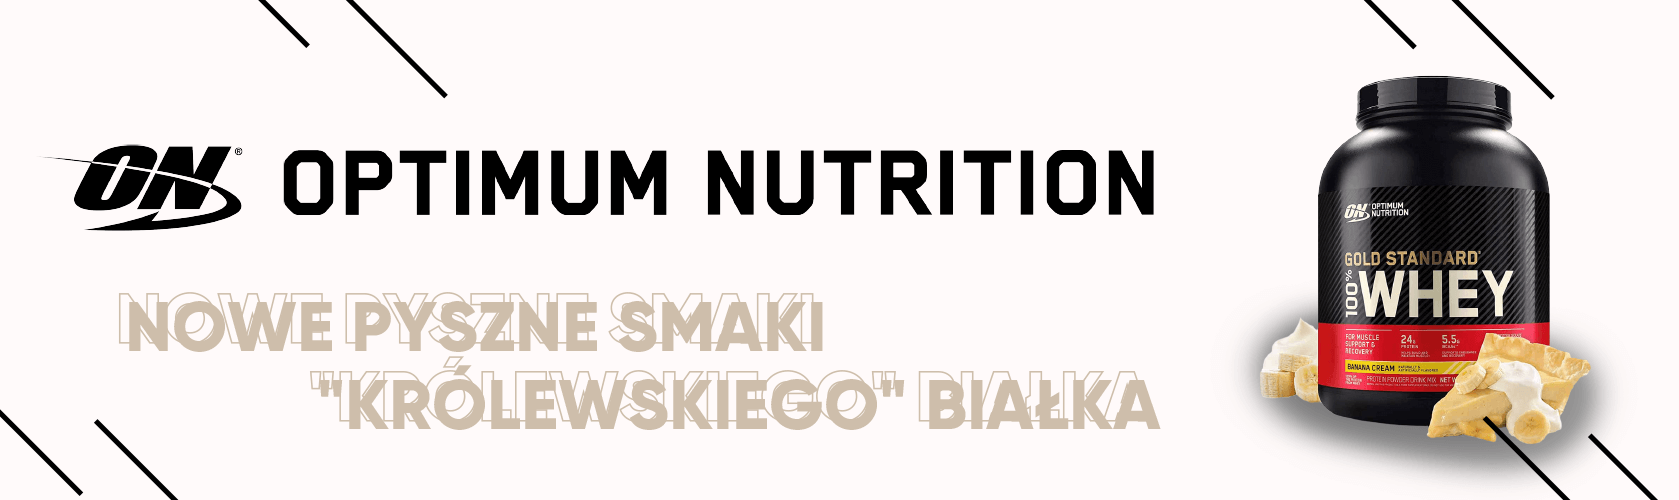 optimum nutrition nowe pyszne smaki krolewskiego bialka elitesportfood